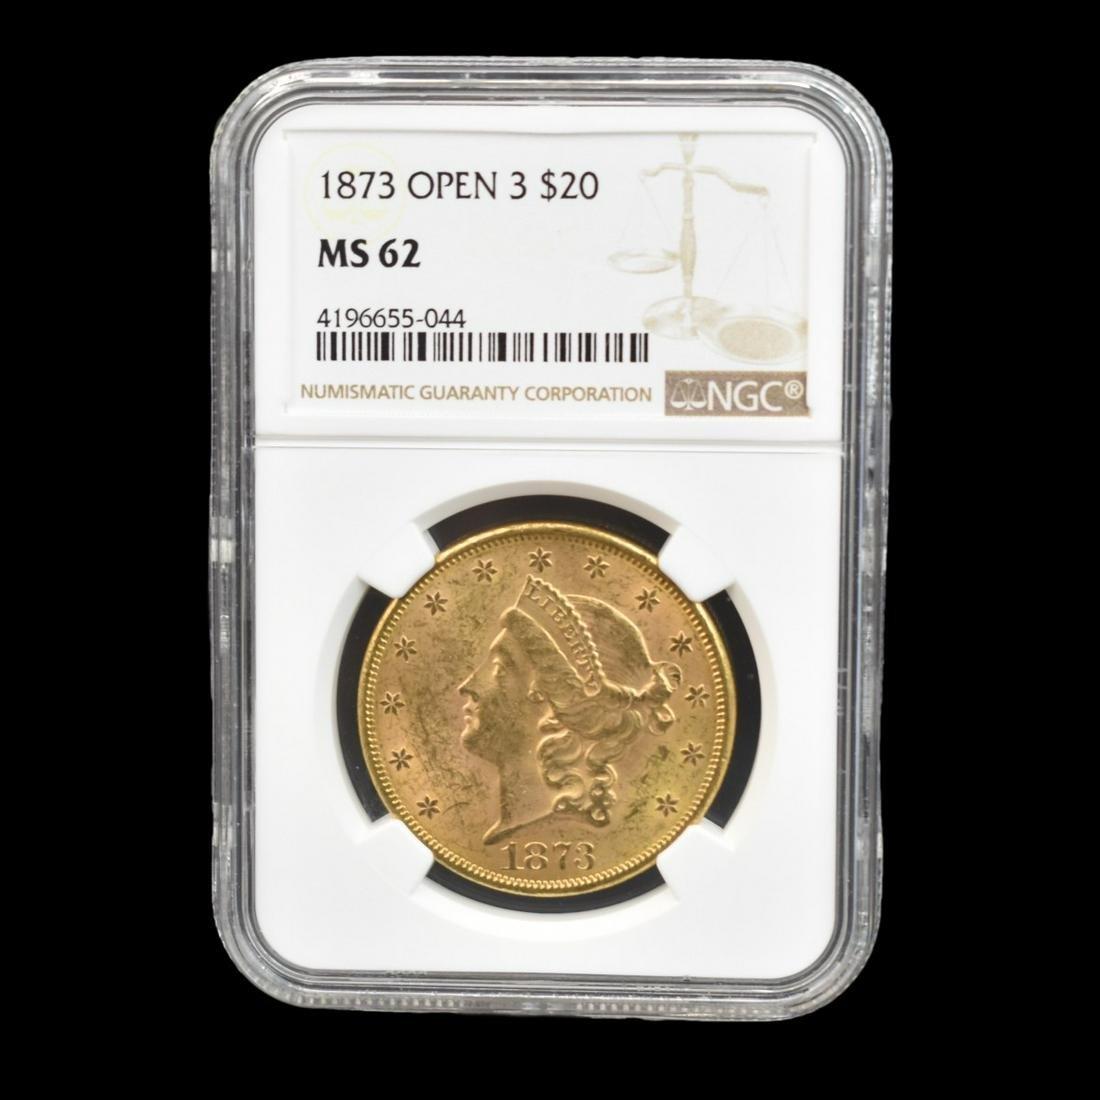 1873 US Liberty Head Twenty Dollar